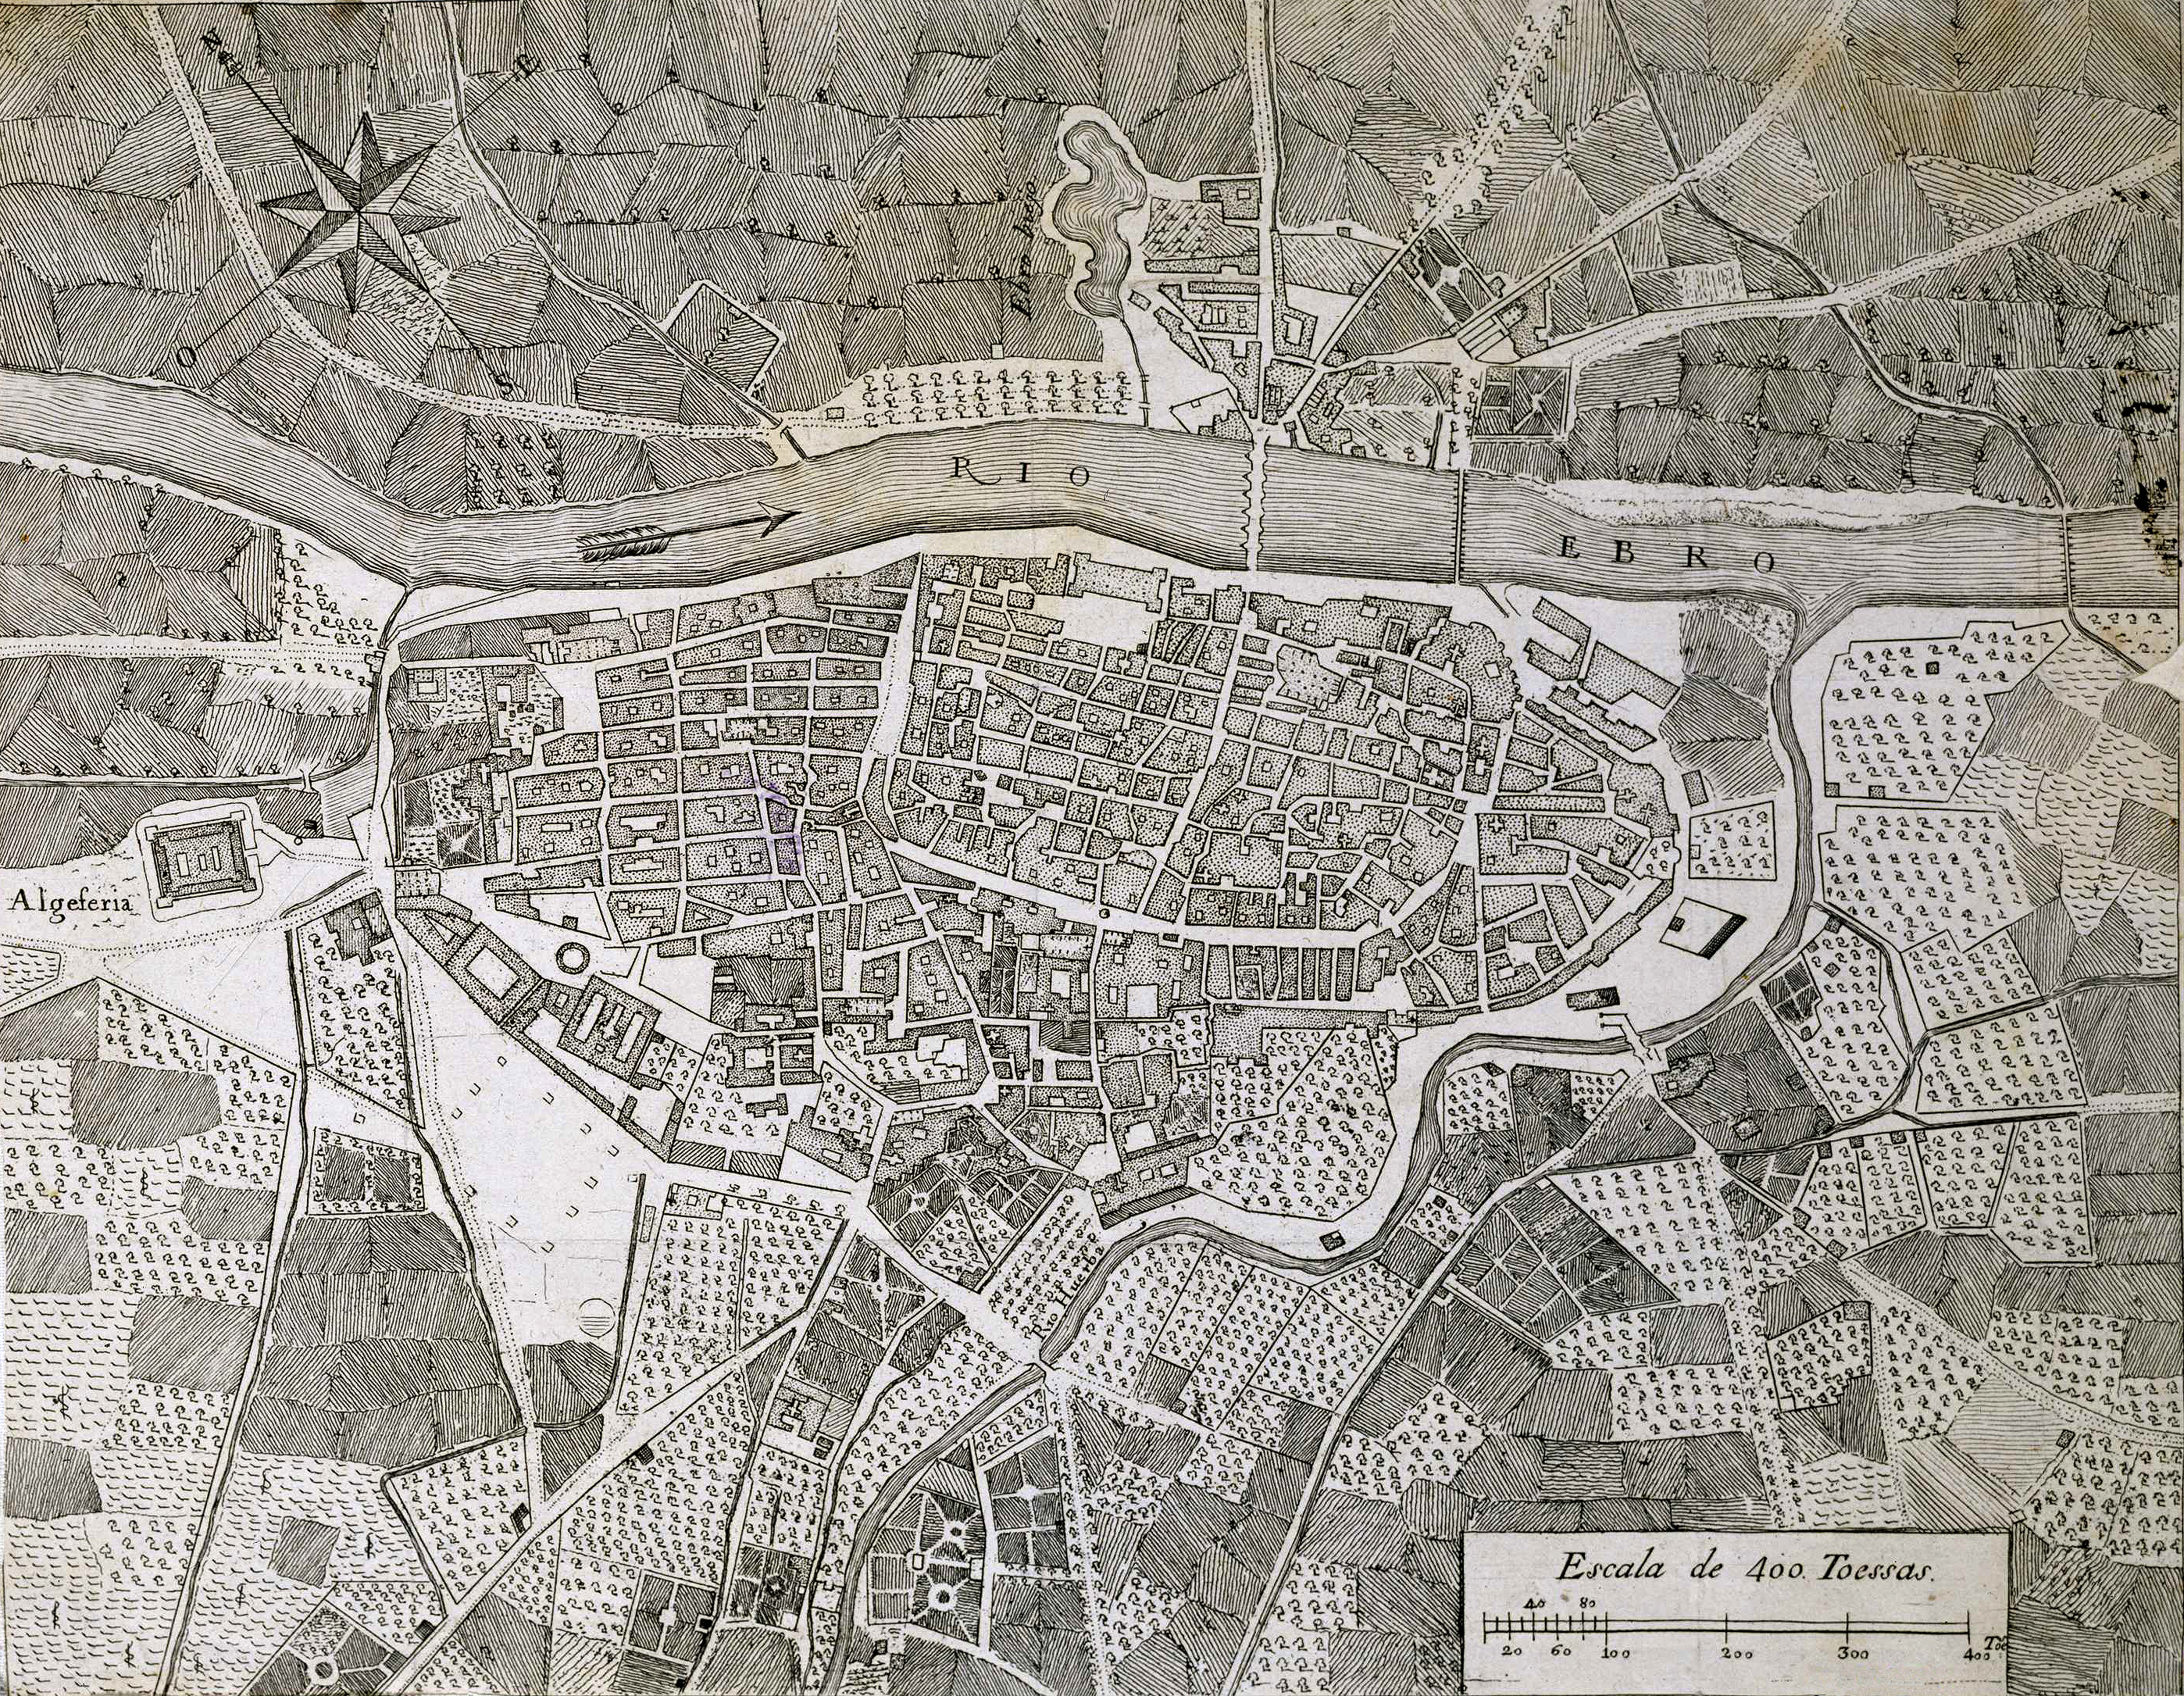 Zaragoza in the XVIII century